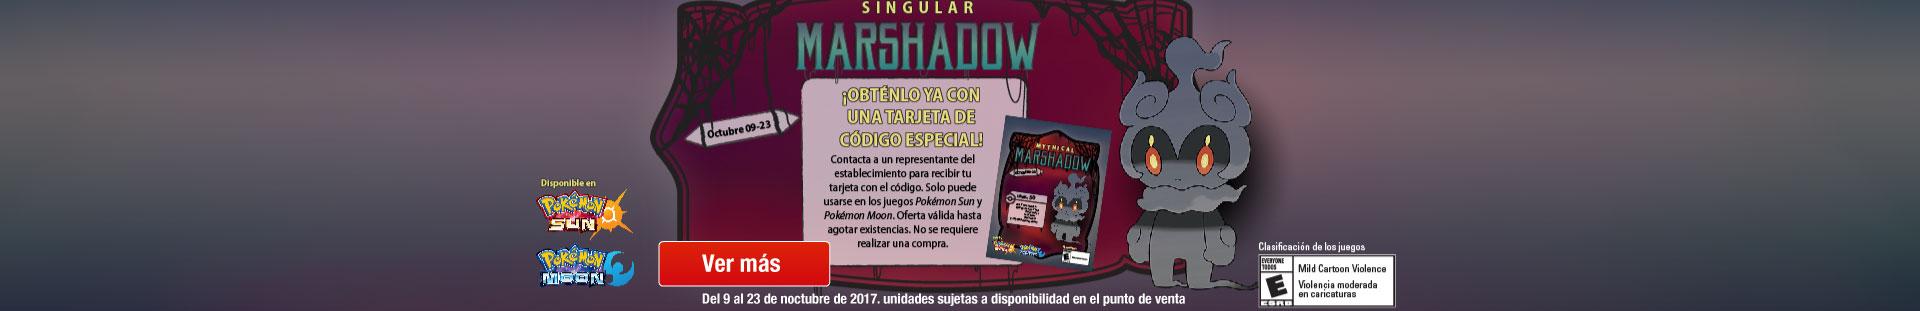 CAT-AK-KT-10-videojuegos-codigogratis-cat-oct9-23